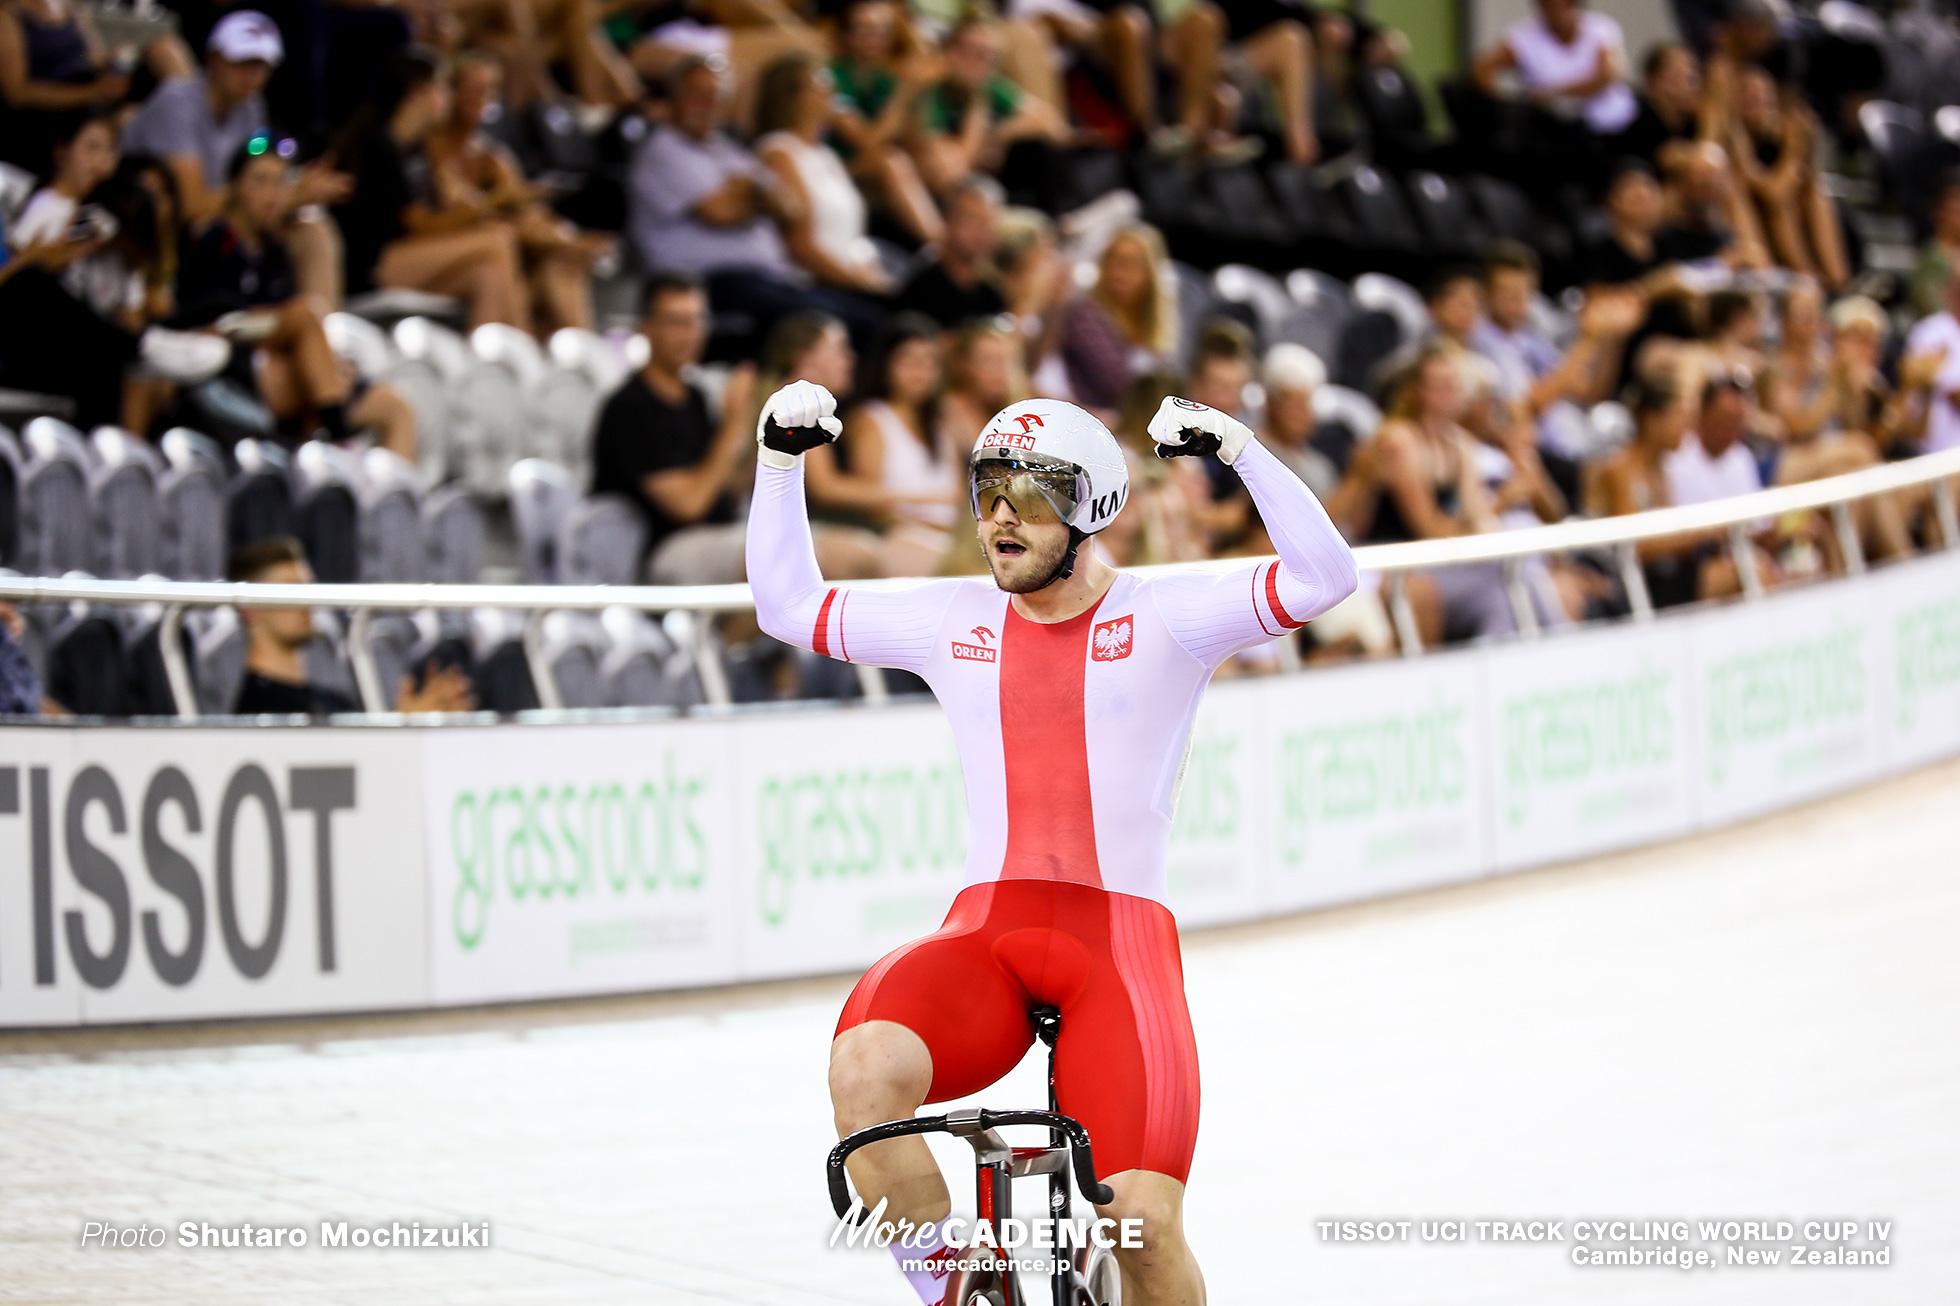 Final / Men's Sprint / TISSOT UCI TRACK CYCLING WORLD CUP IV, Cambridge, New Zealand, Mateusz Rudyk マテウス・ルディク